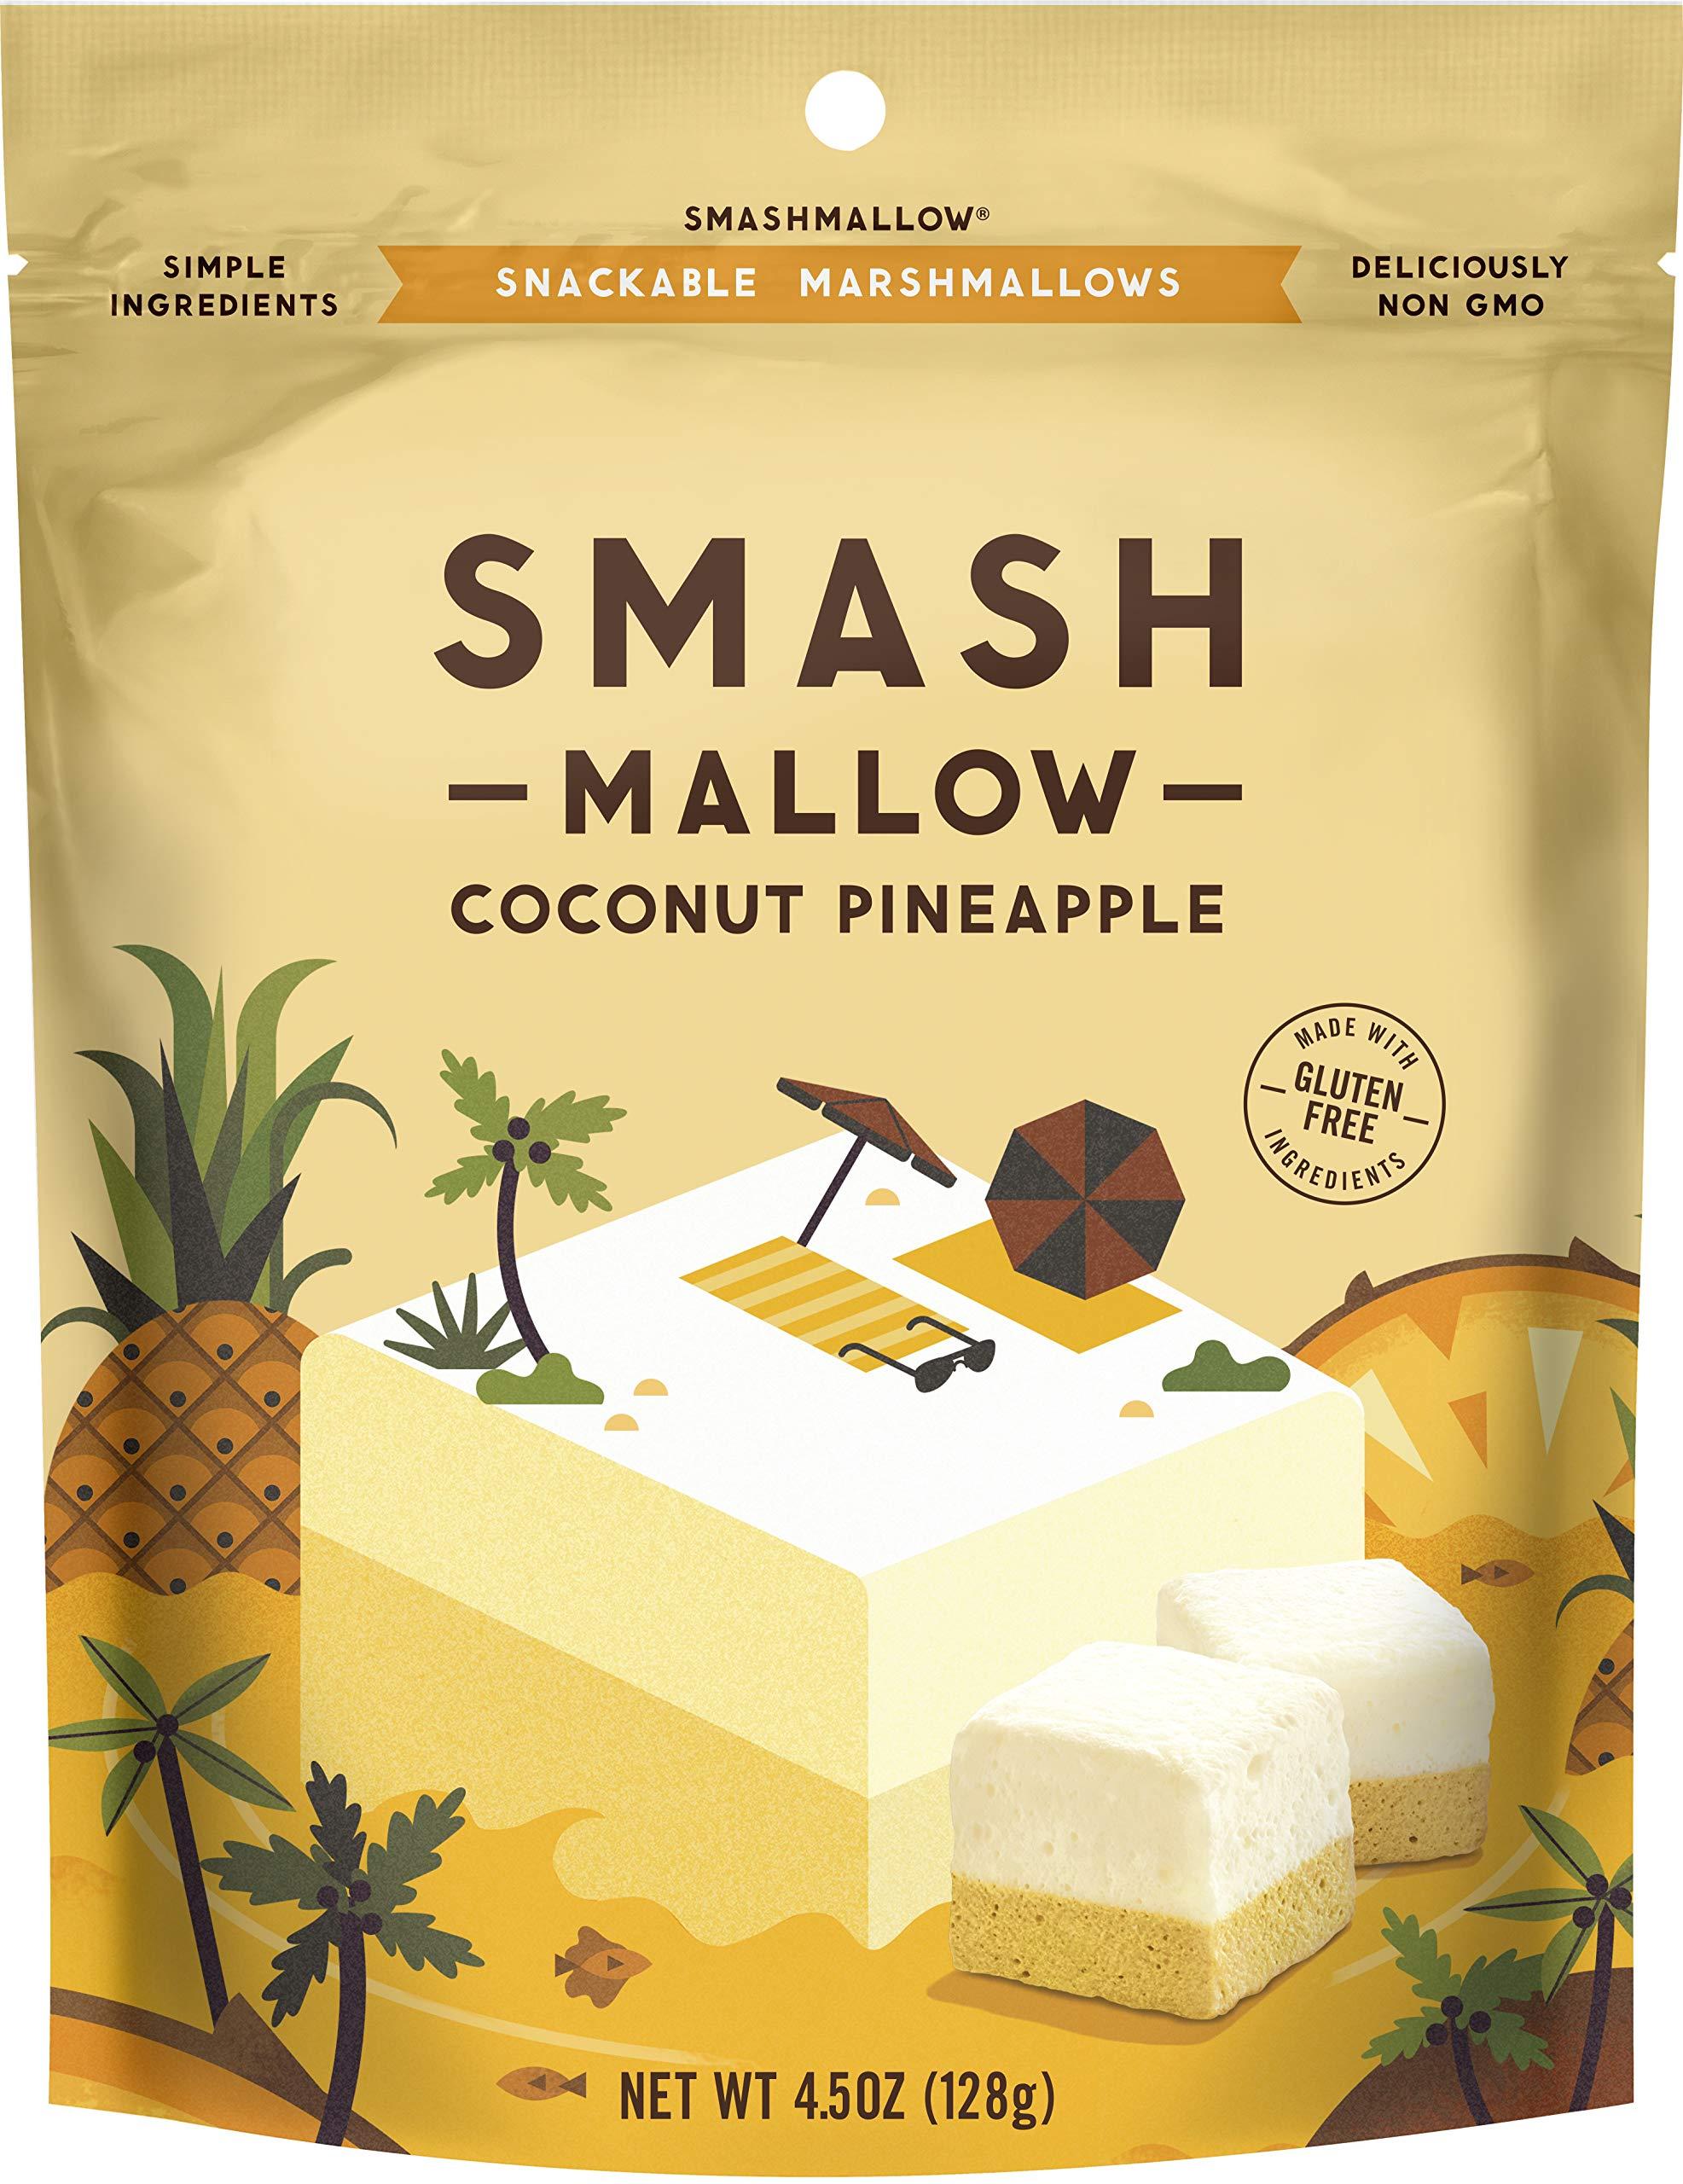 Coconut Pineapple by SMASHMALLOW | Snackable Marshmallows | Non-GMO | Organic Cane Sugar | 80 calories | (4.5 oz) by Smashmallow